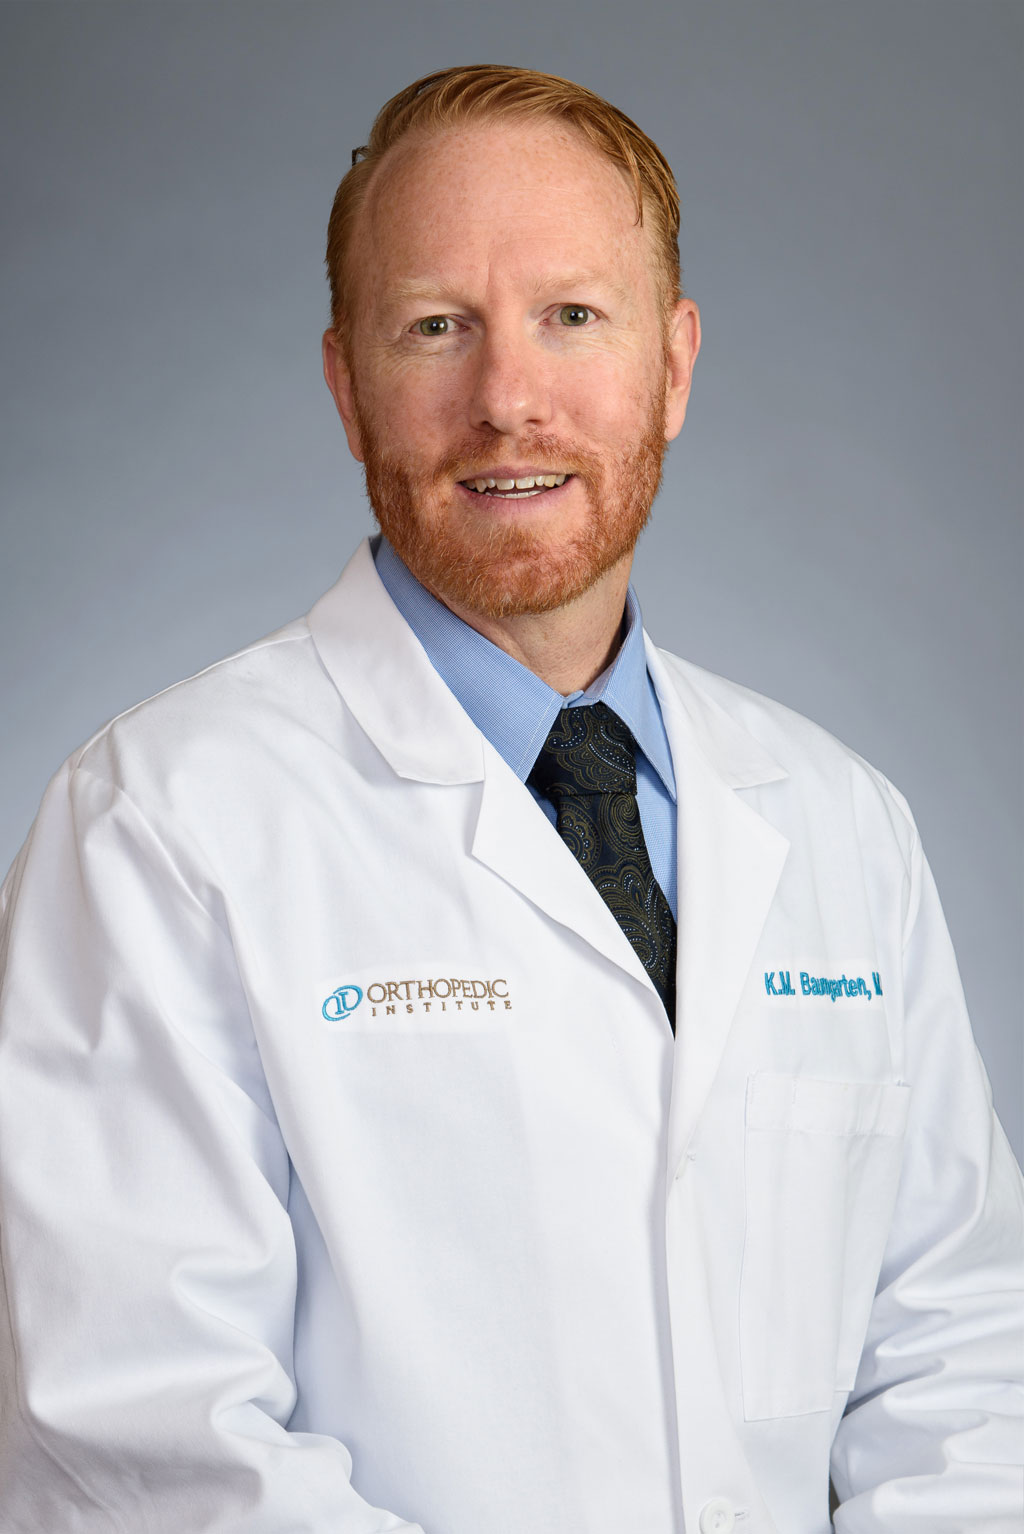 Keith M. Baumgarten